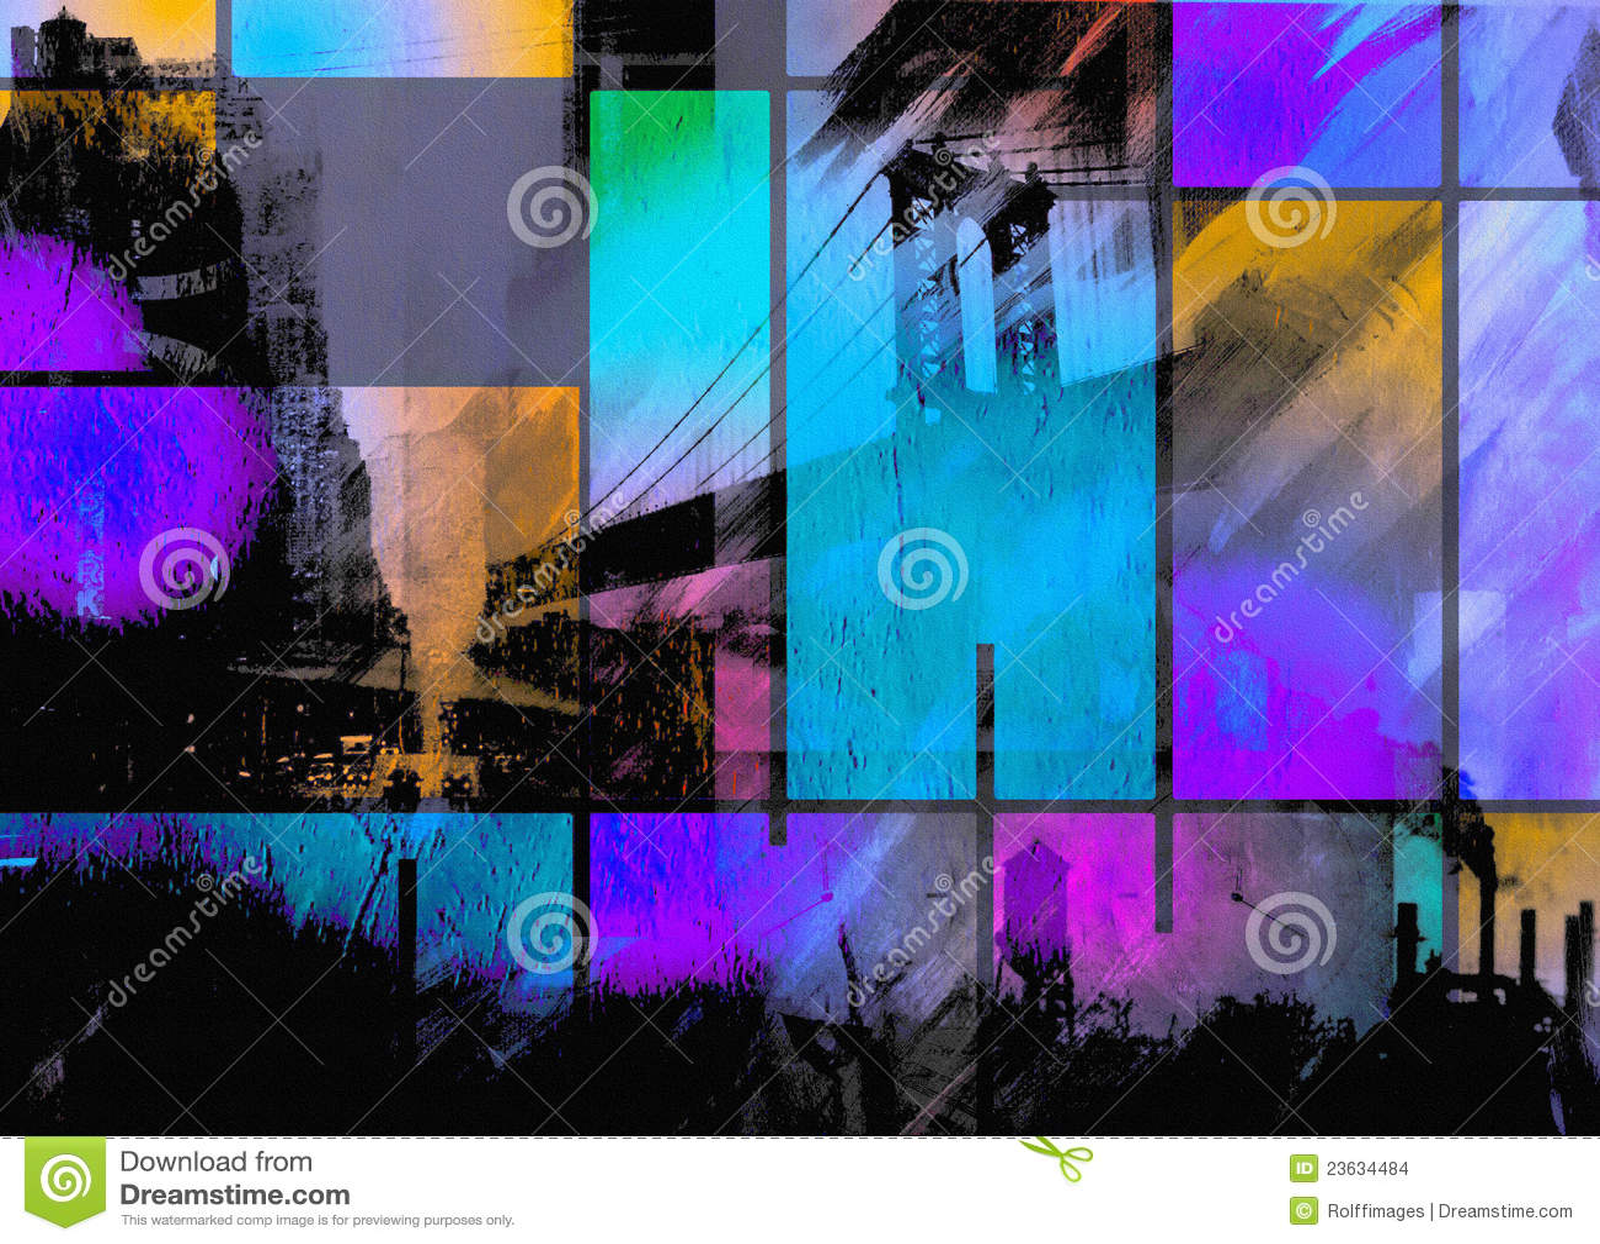 Modern art inspired city abstract